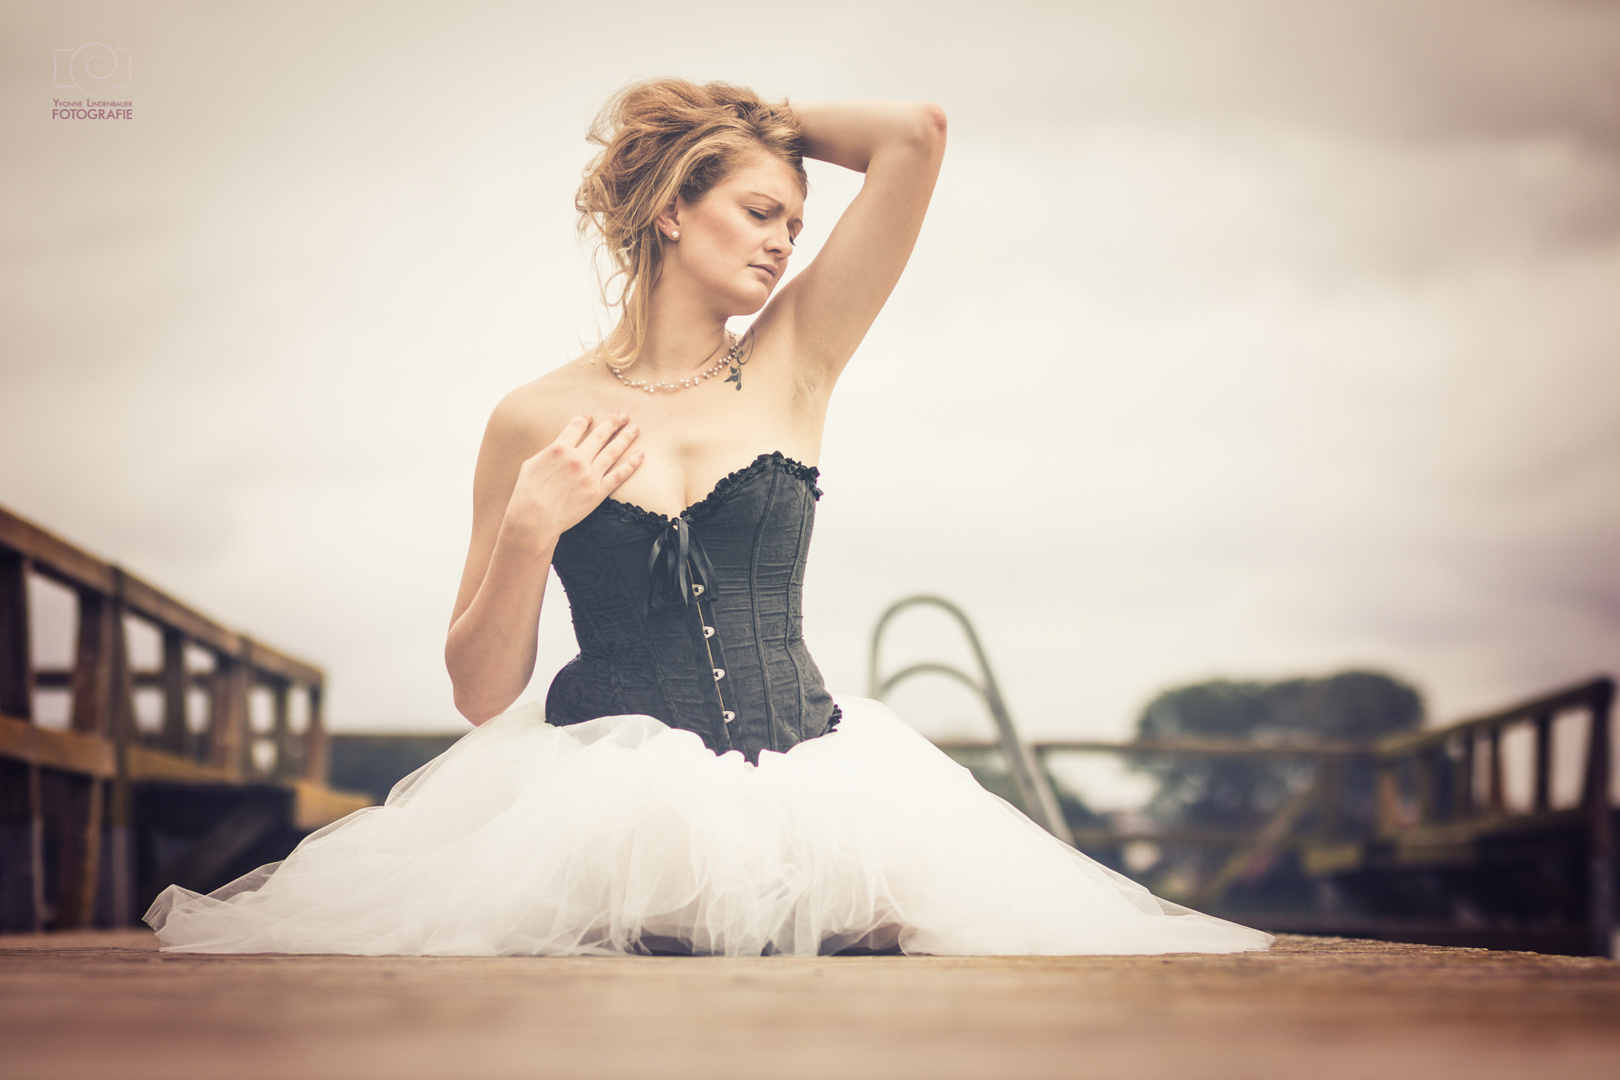 Sensual Portrait of Anna Foto & Bild | portrait, portrait